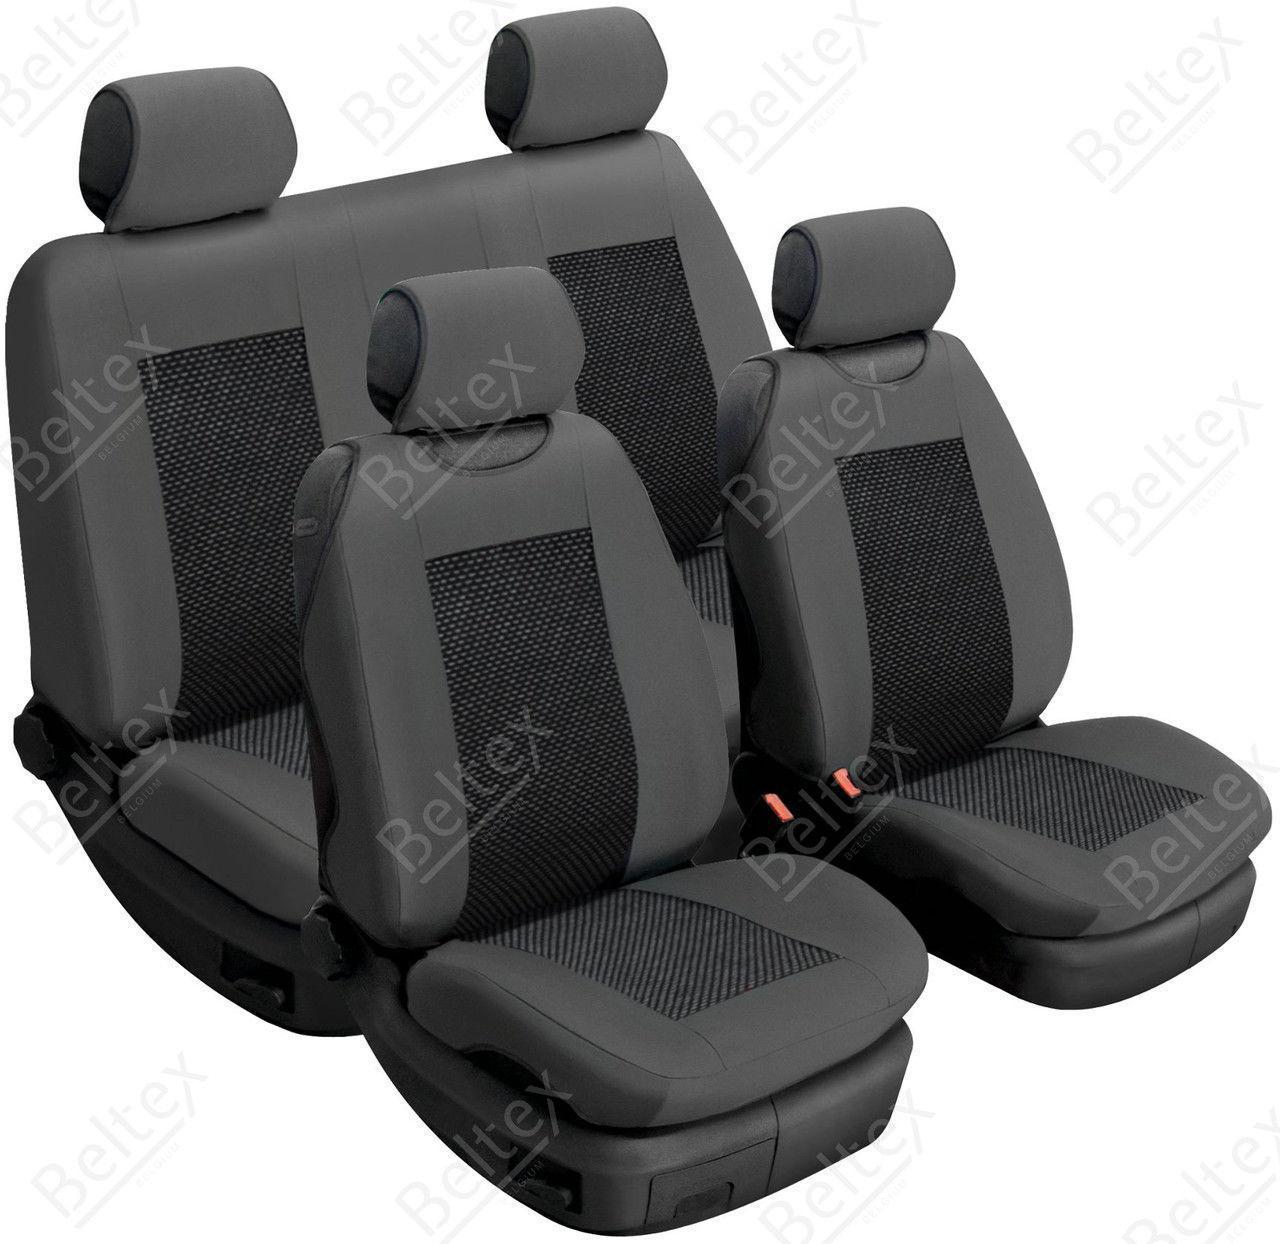 Майки/чехлы на сиденья Субару Форестер (Subaru  Forester)